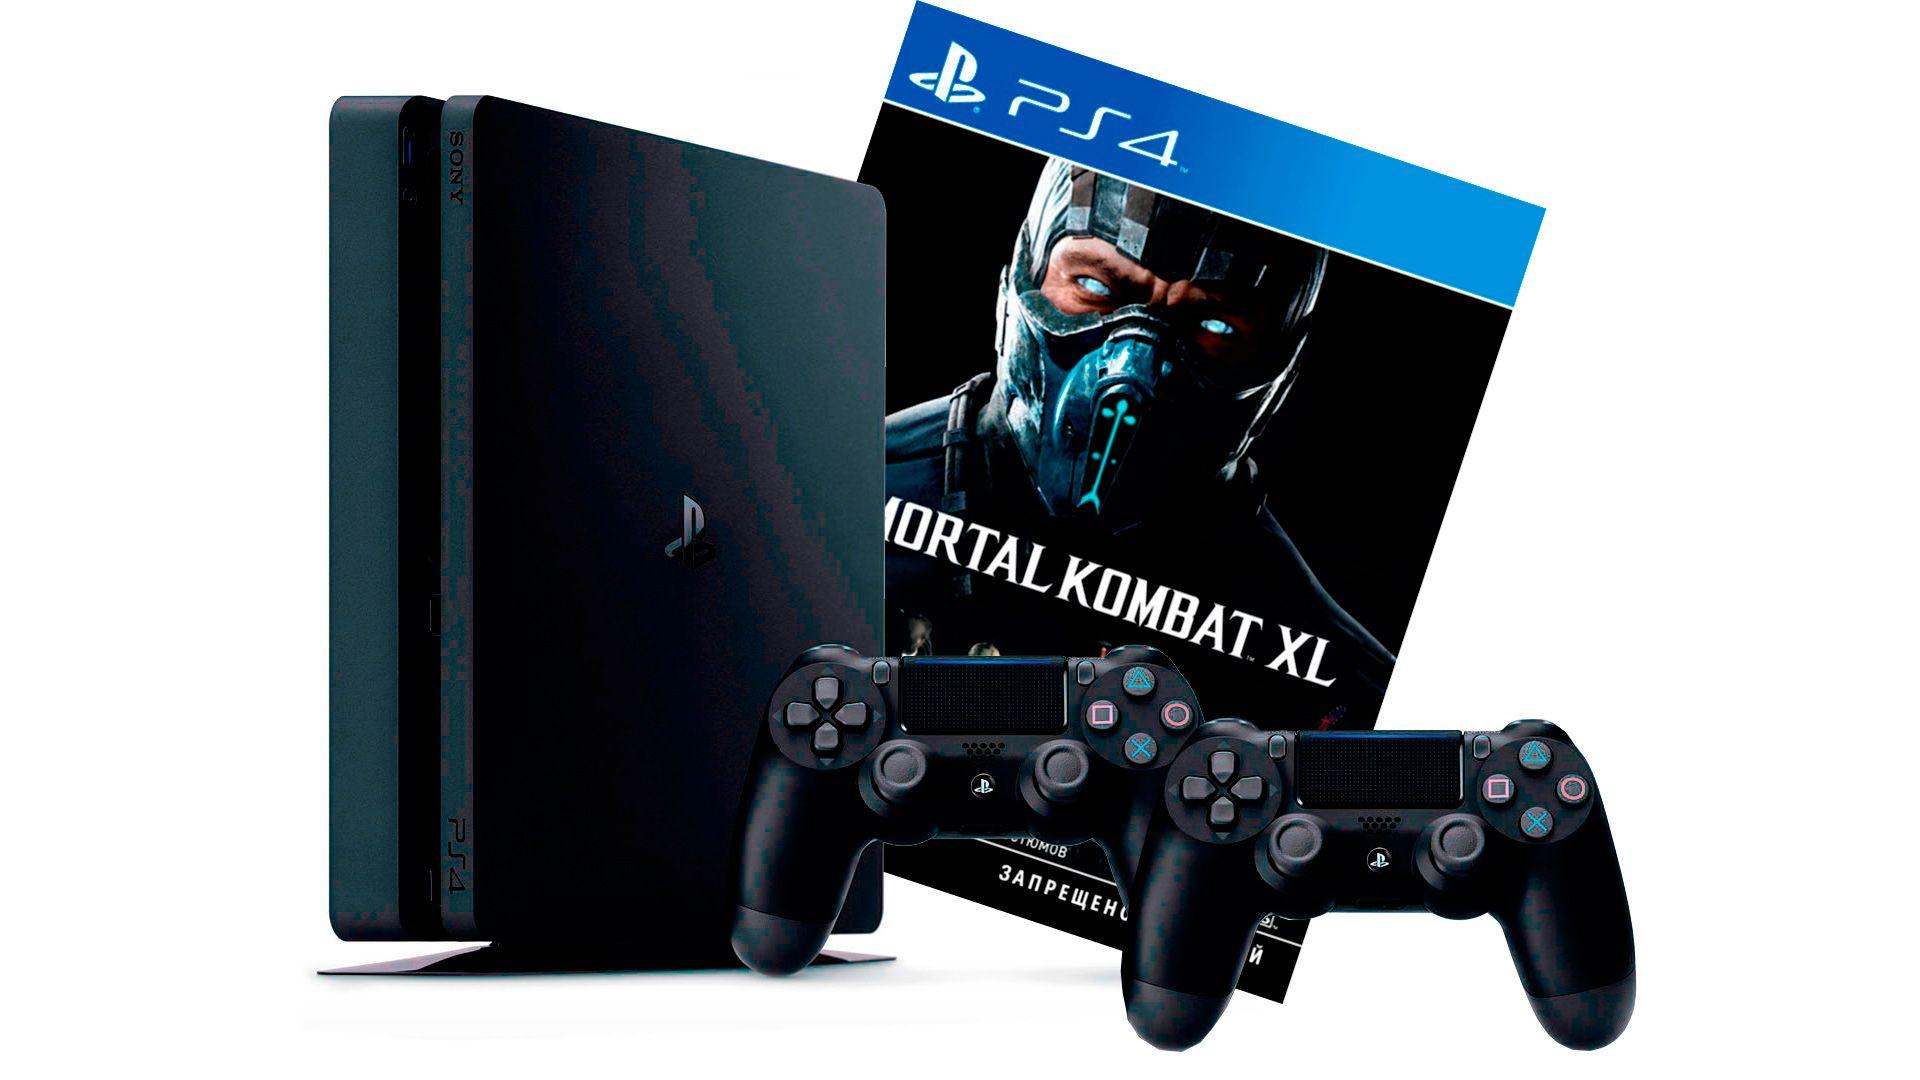 PlayStation 4 Slim 1Tb 2 джойстика, приставка и игра Mortal Kombat XL [PS4S1J2MXL]